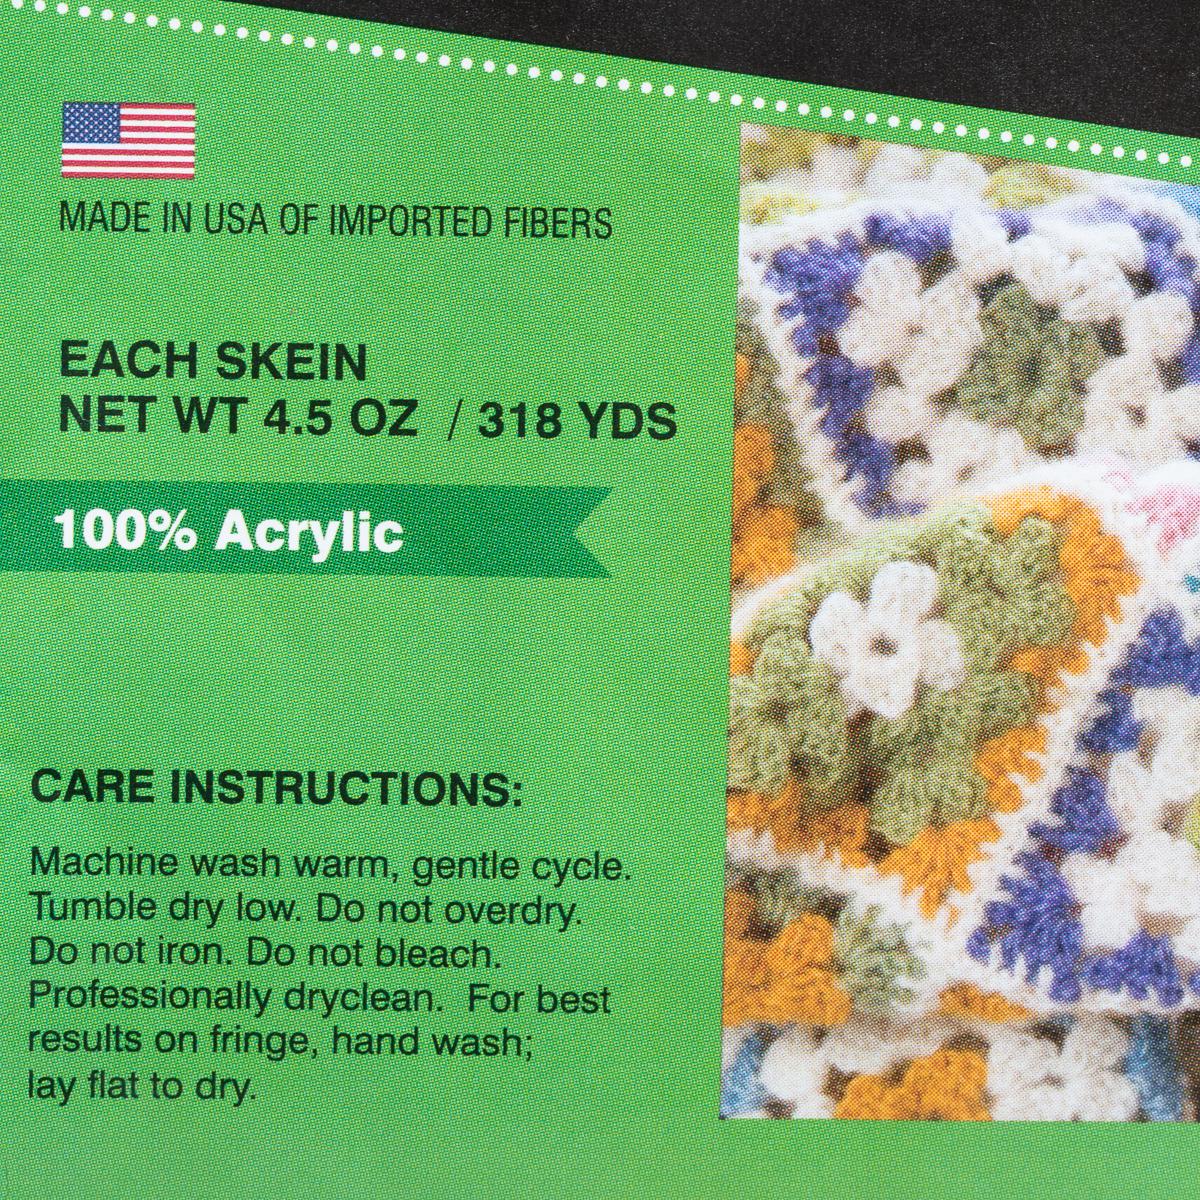 4-Dream-Weaver-Solid-S-Twist-100-Acrylic-Yarn-Skeins-Light-3-Knit-Crochet-Soft thumbnail 11